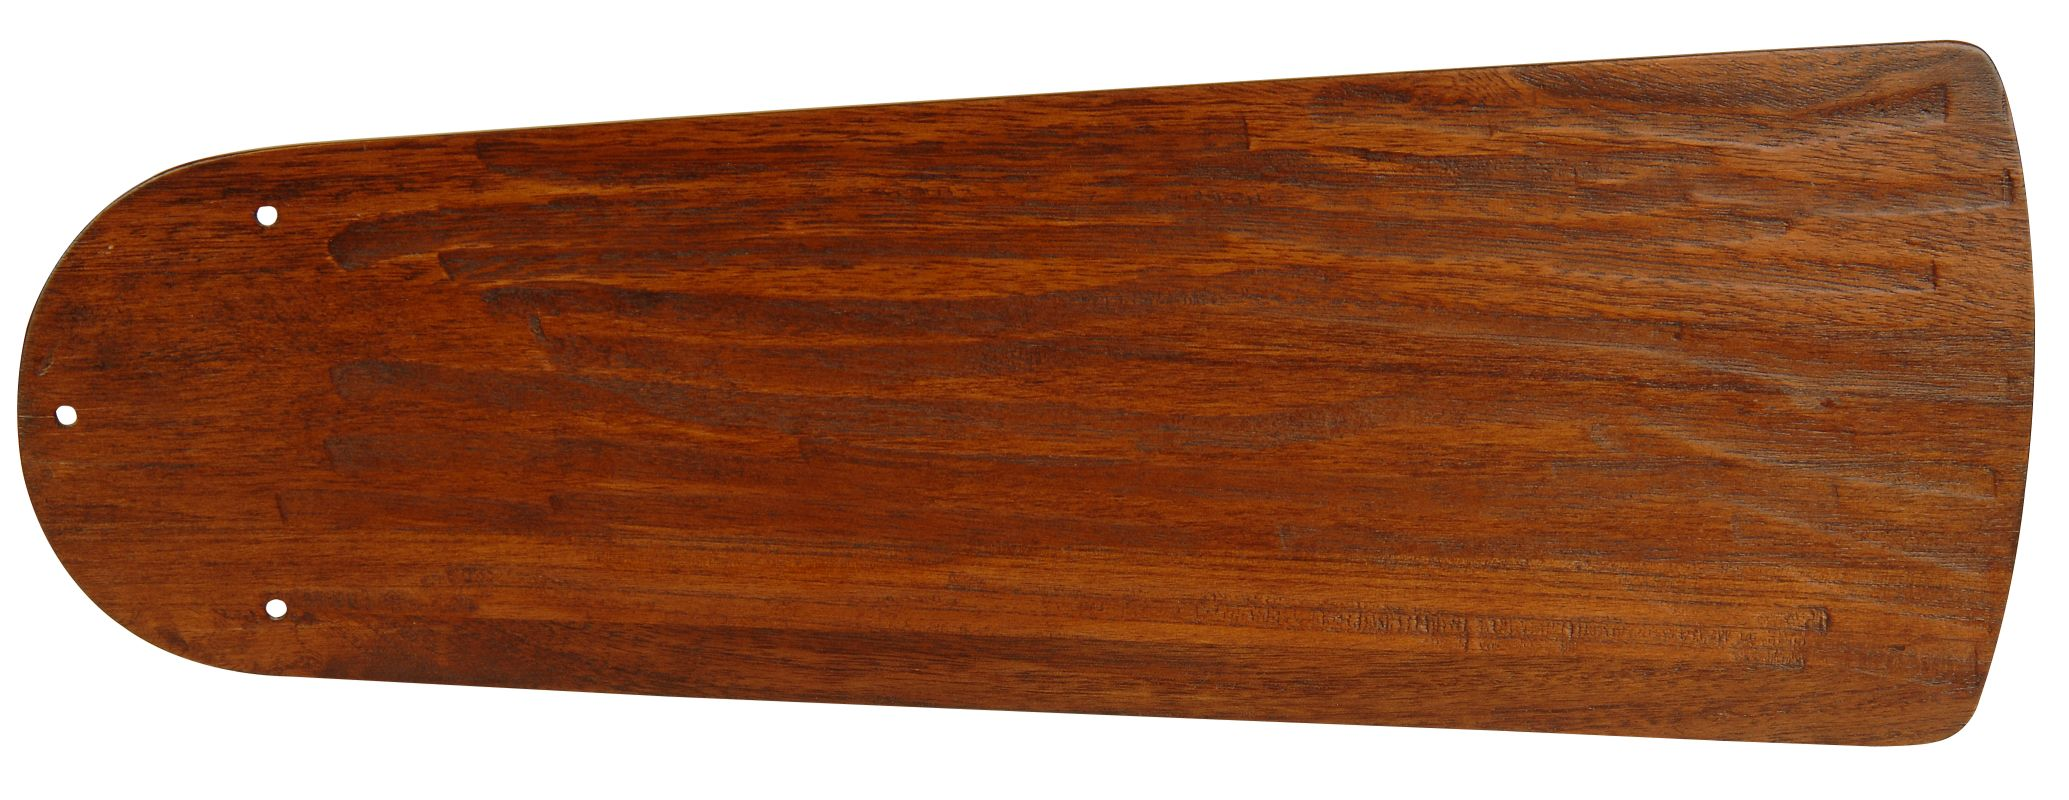 "Craftmade B554P 5 Blade Pack - 54"" Premier Blades Hand-Scraped Teak"